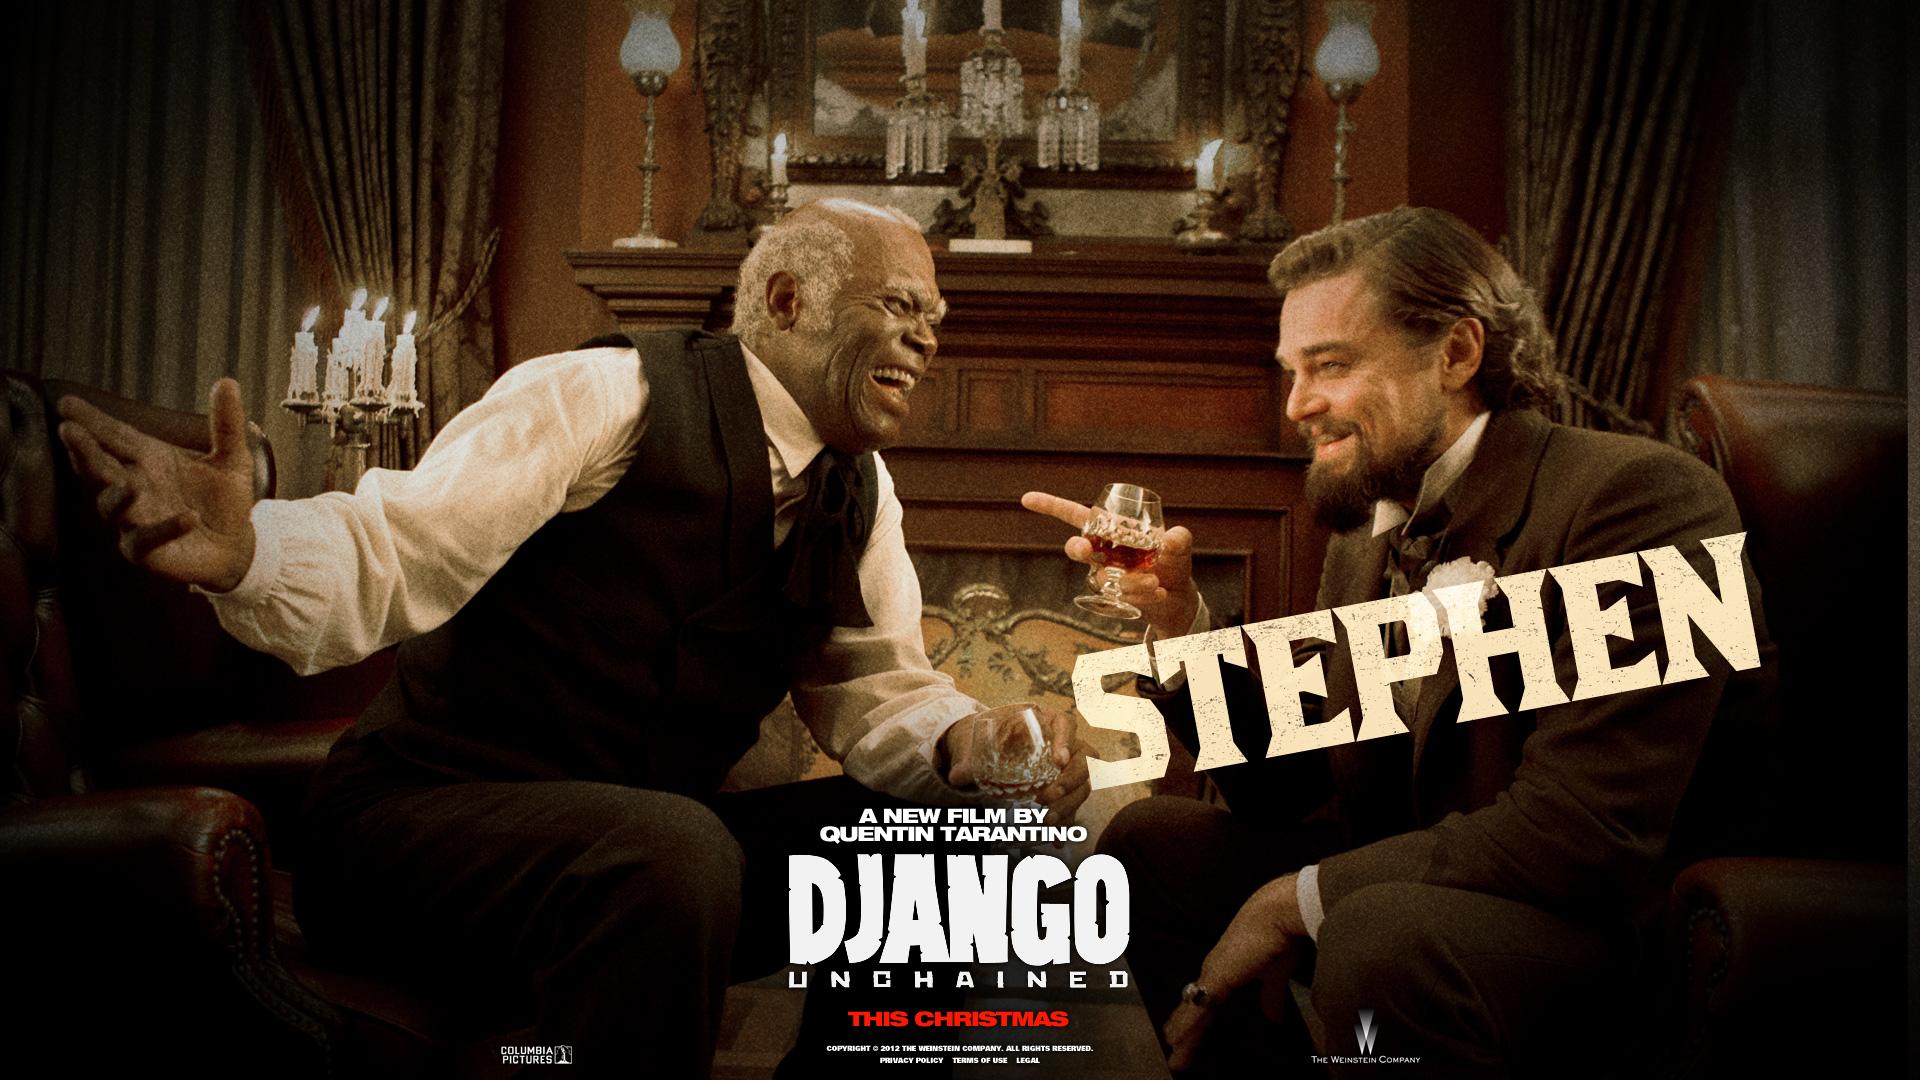 Academy Award Nominee 'Django Unchained': Film Review